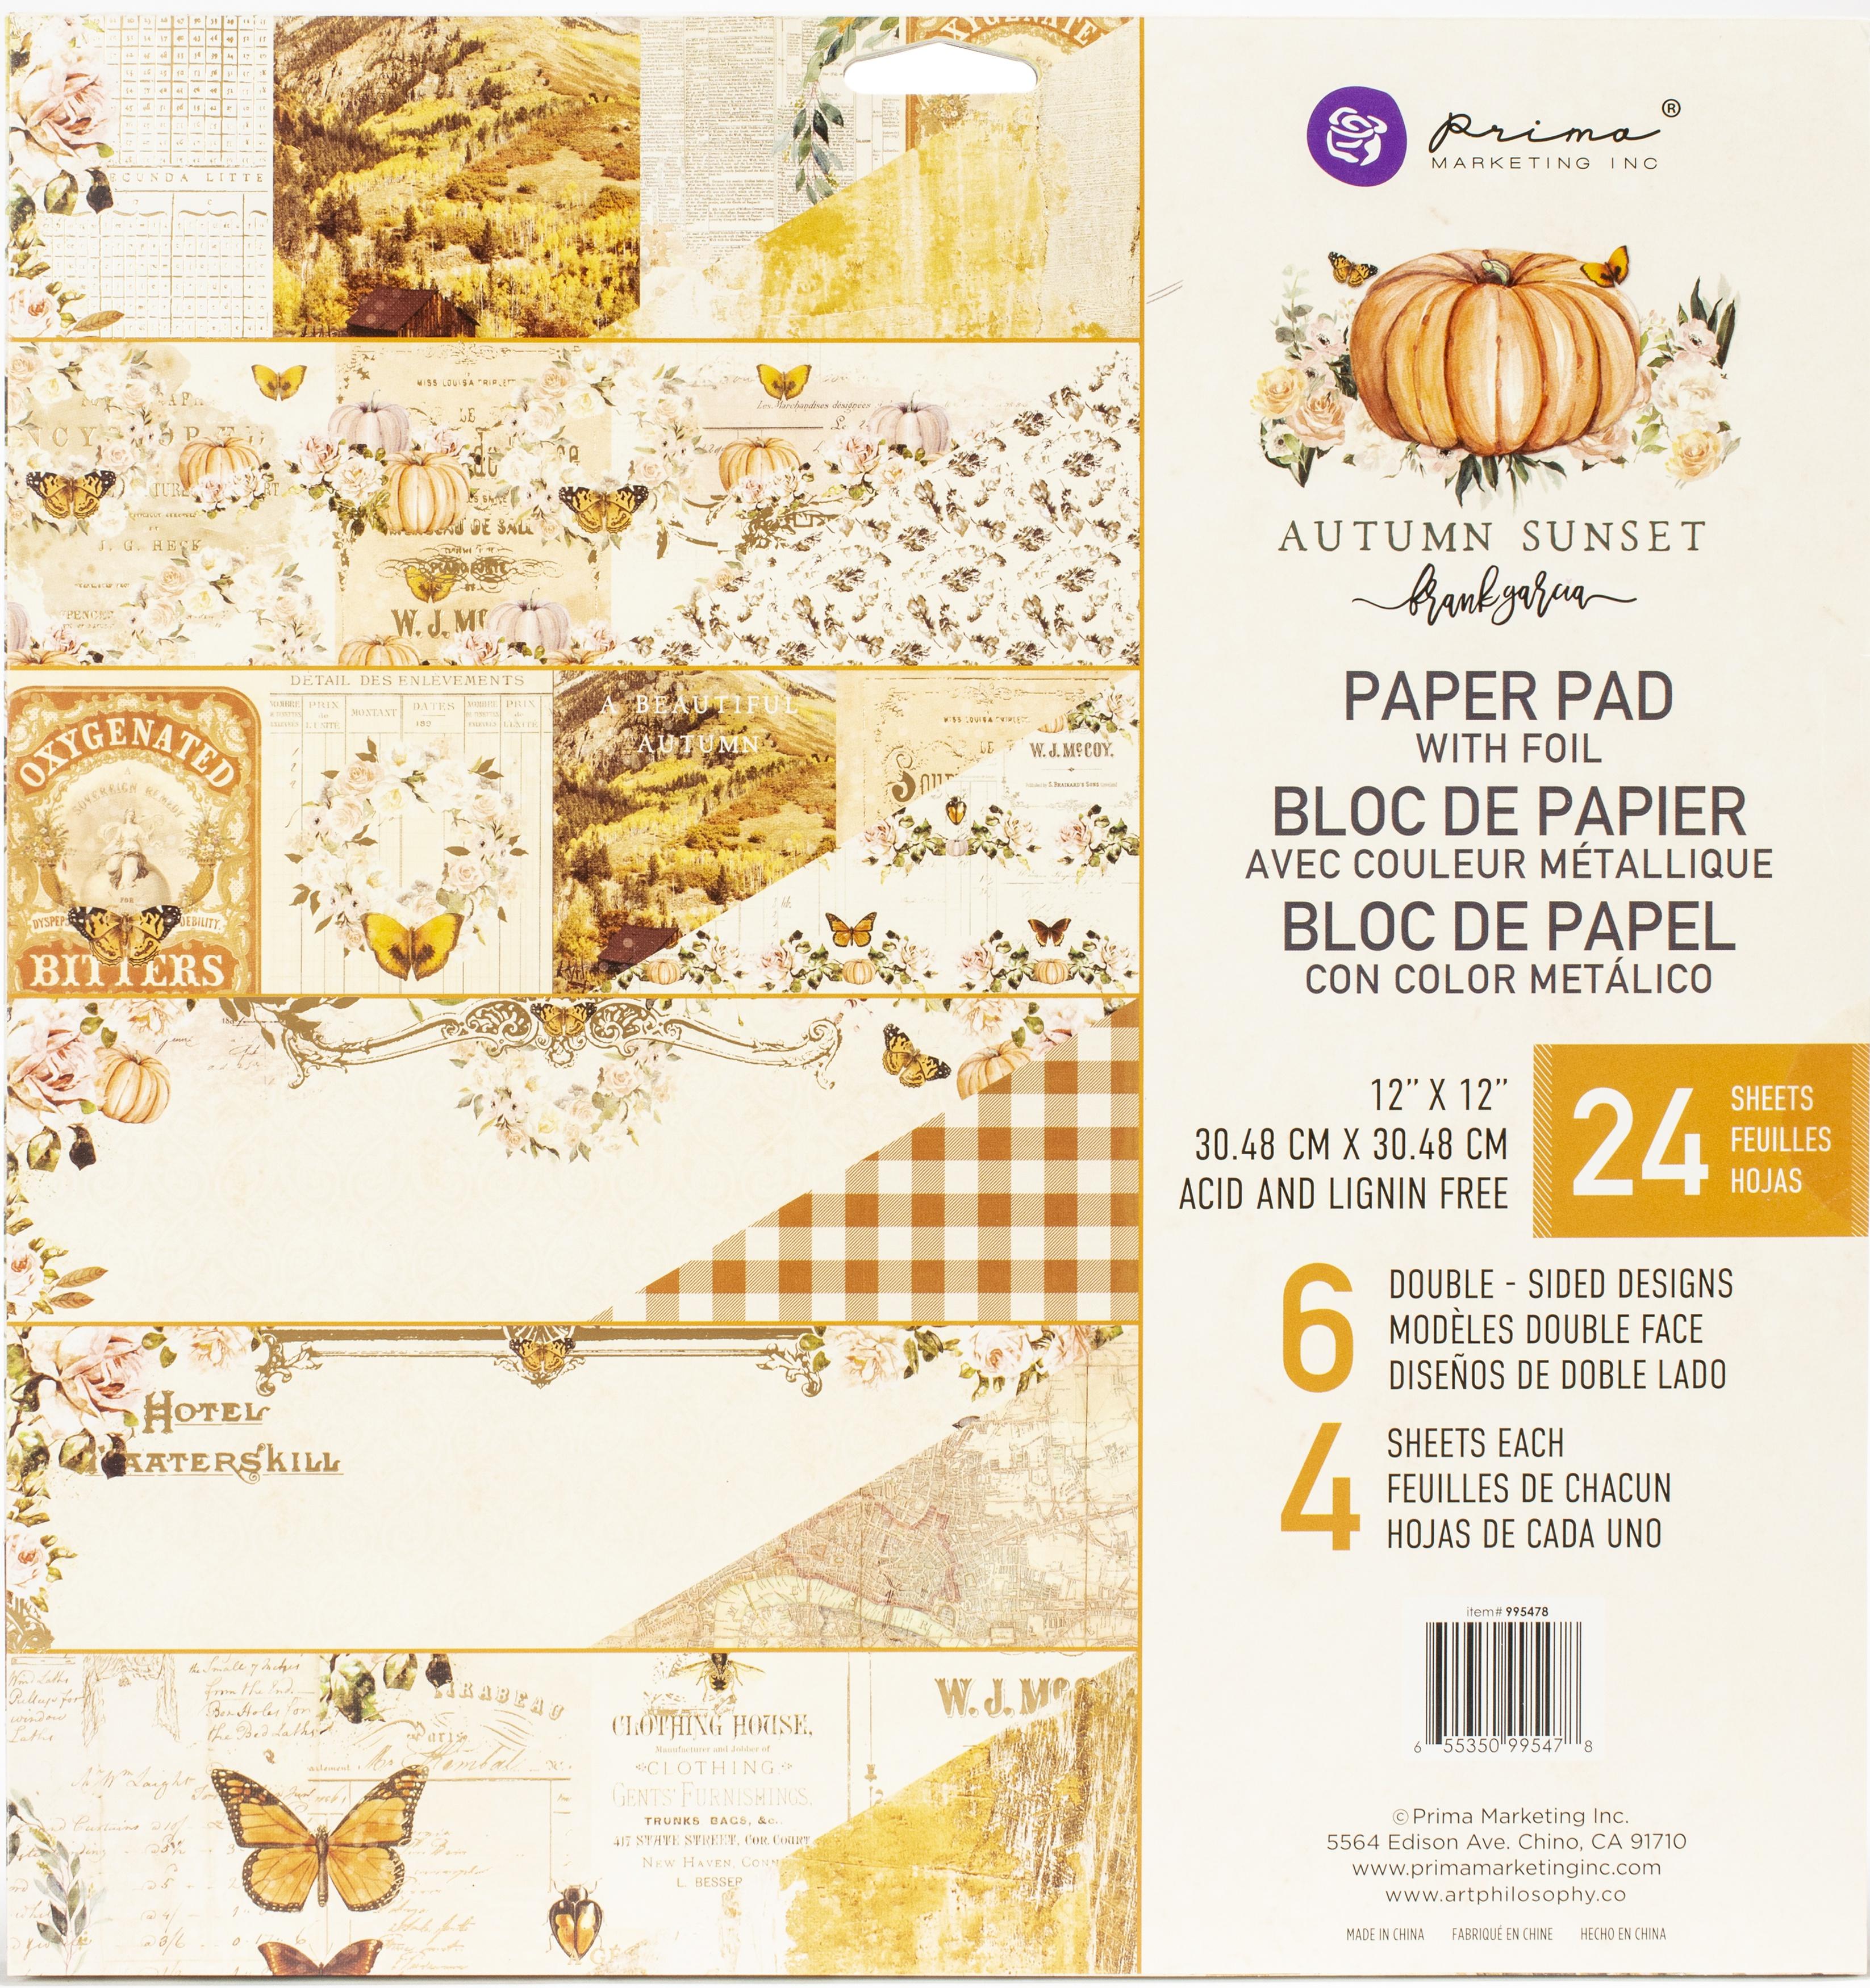 Prima - Autumn Sunset 12x12 Paper Pad with Foil